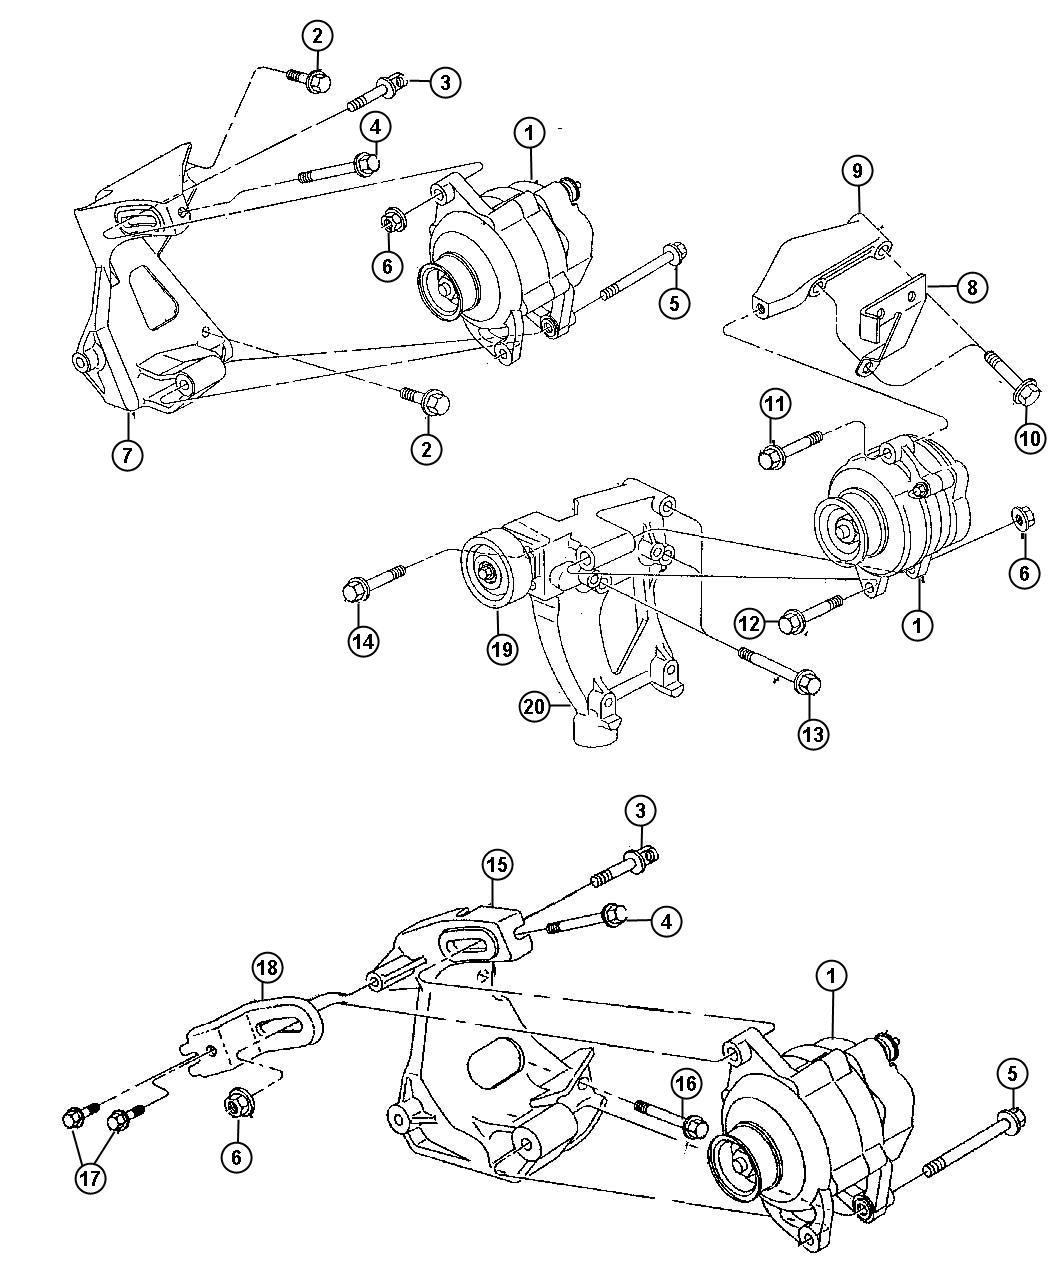 Alternator components diagram free engine